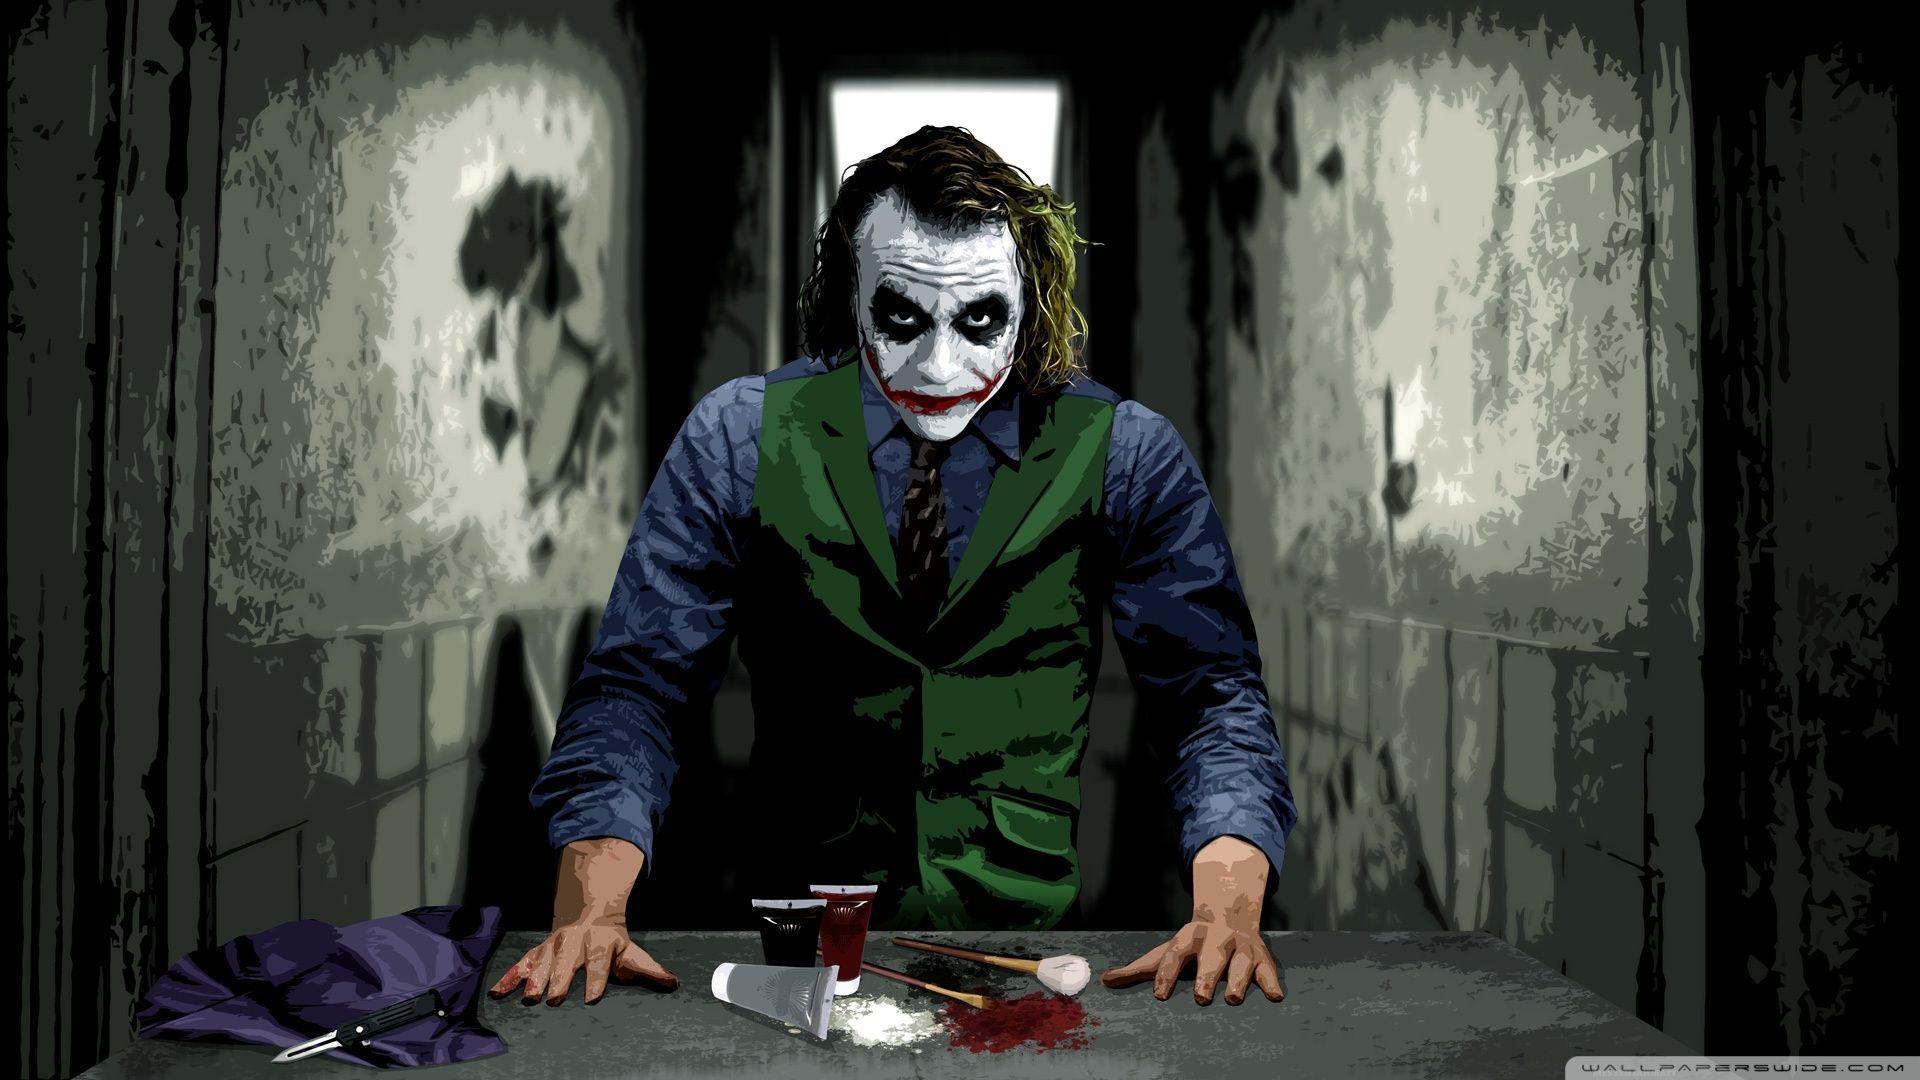 Heath Ledger Joker Wallpaper Hd Amnet